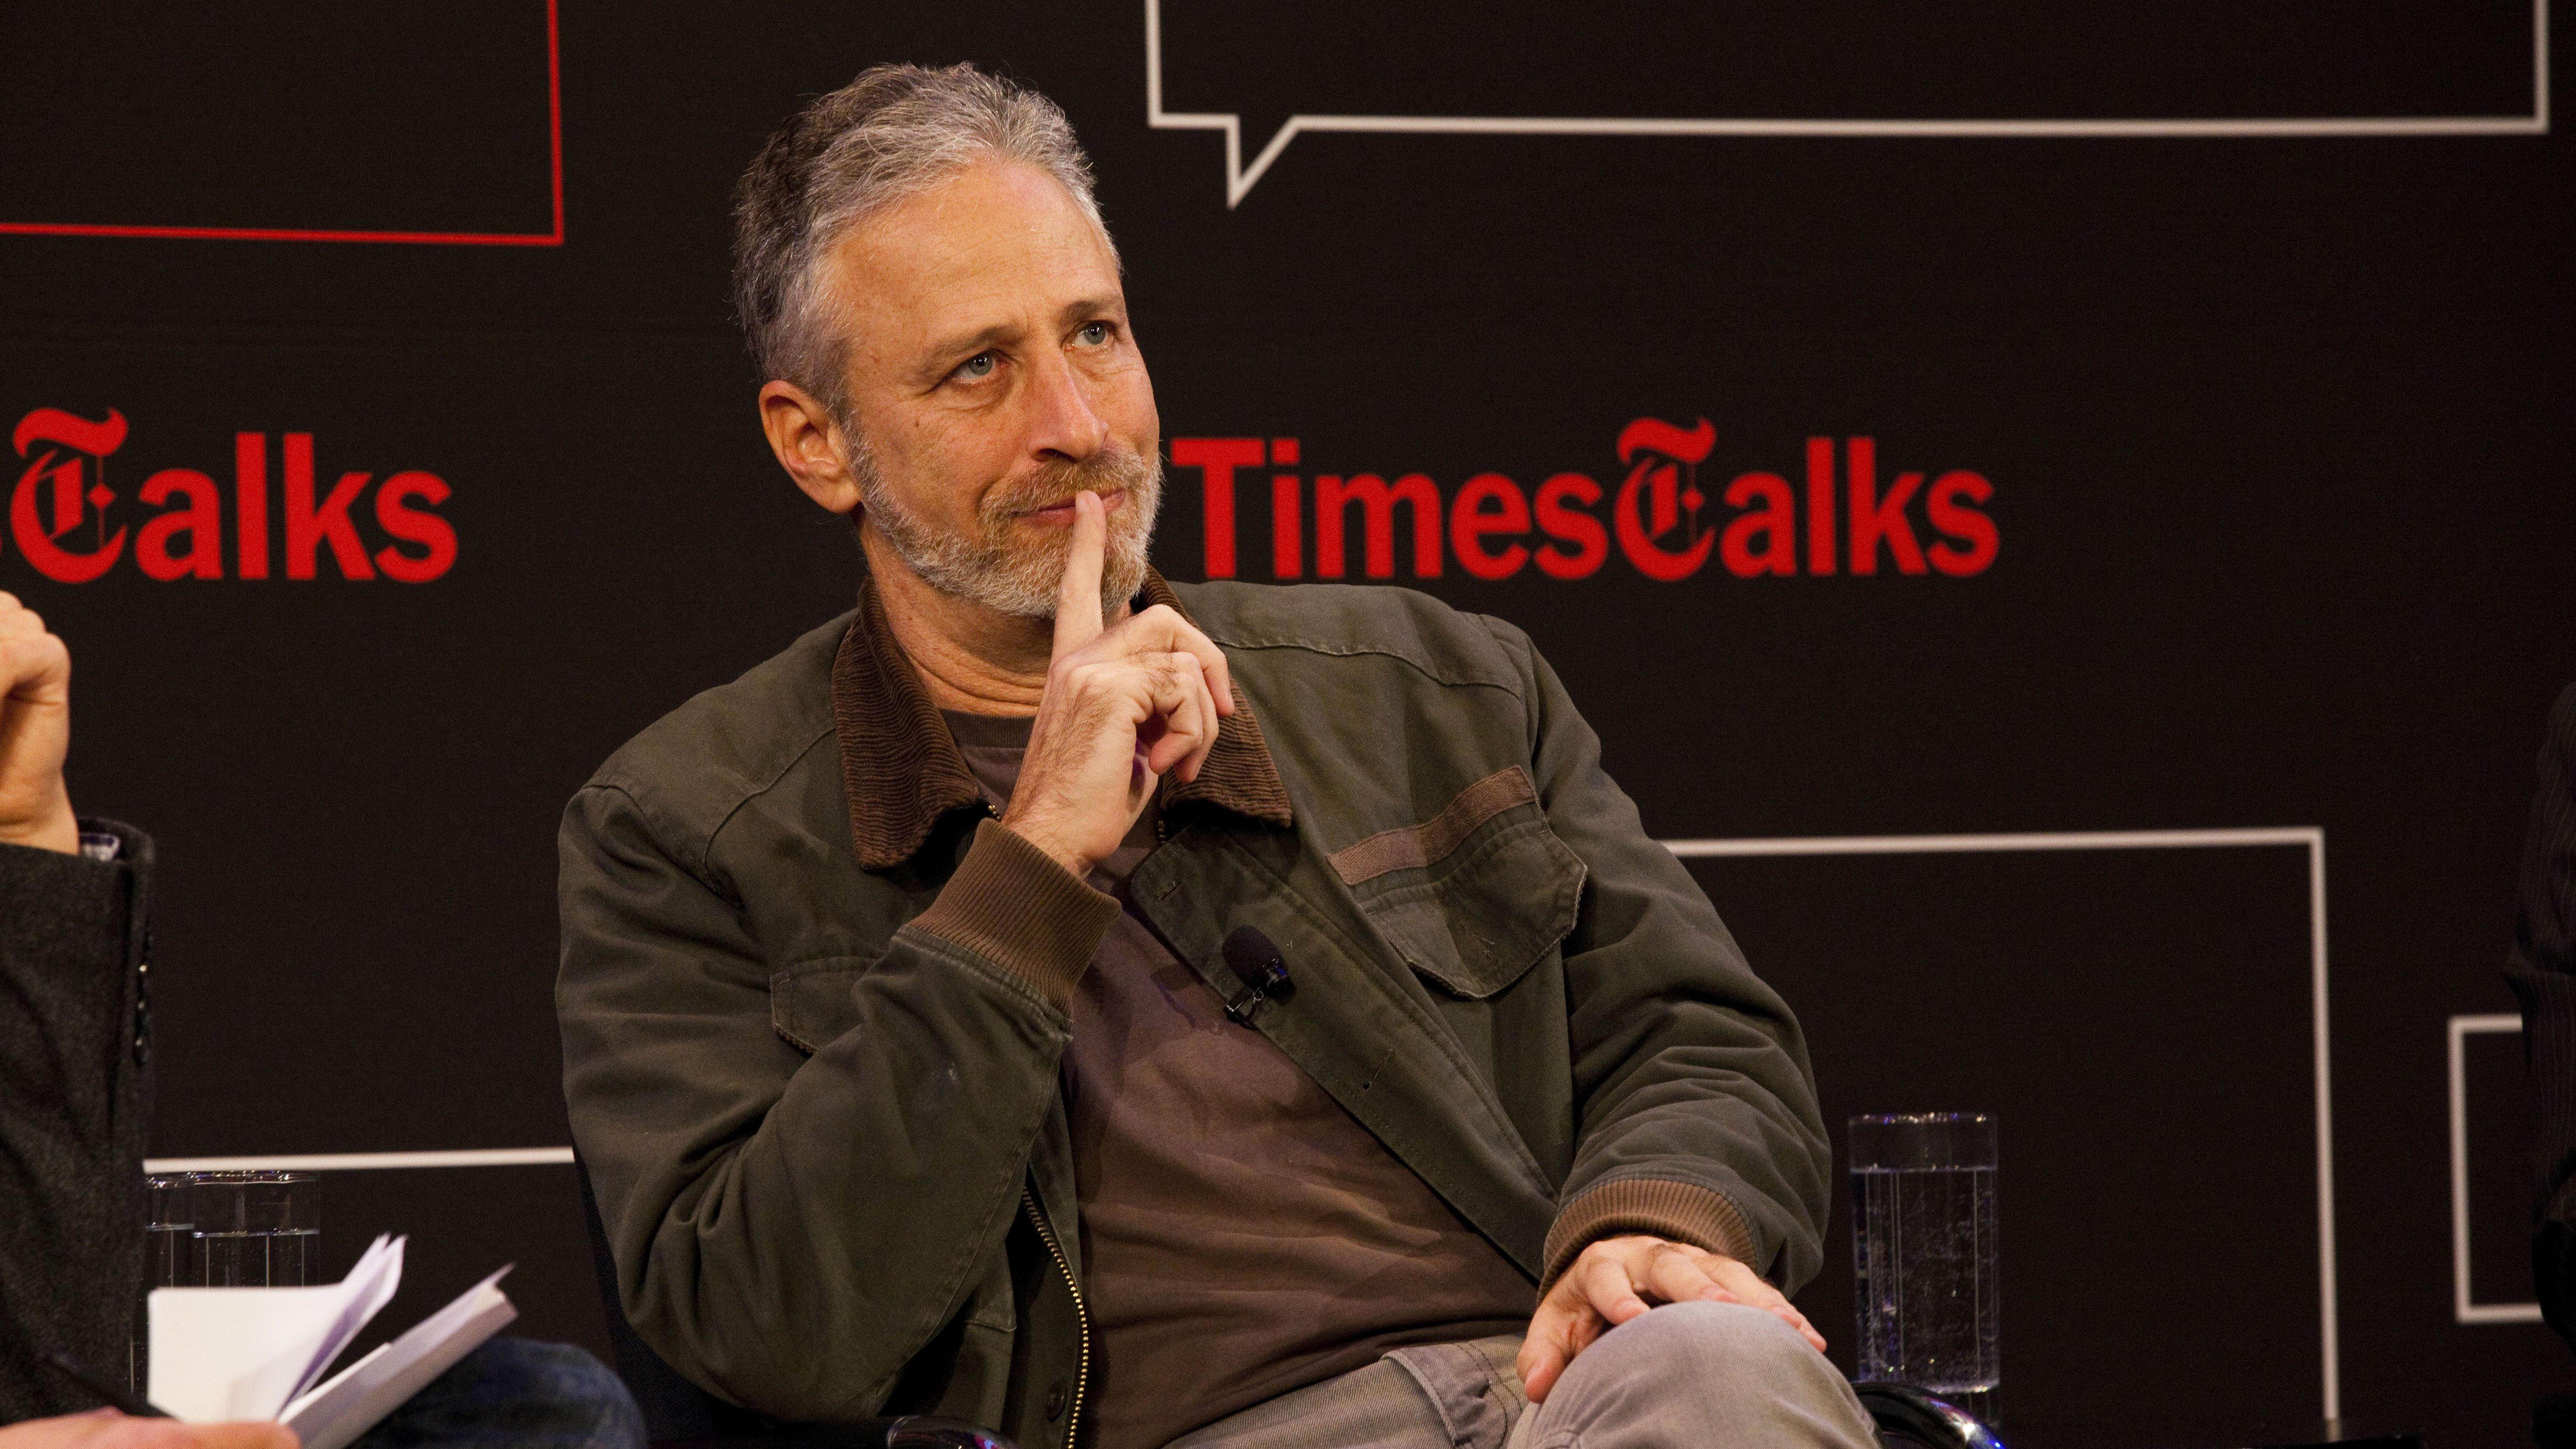 Times Talks with James Poniewozik,  Jon Stewart and Chris Smith. Photo by Steve Meyer.